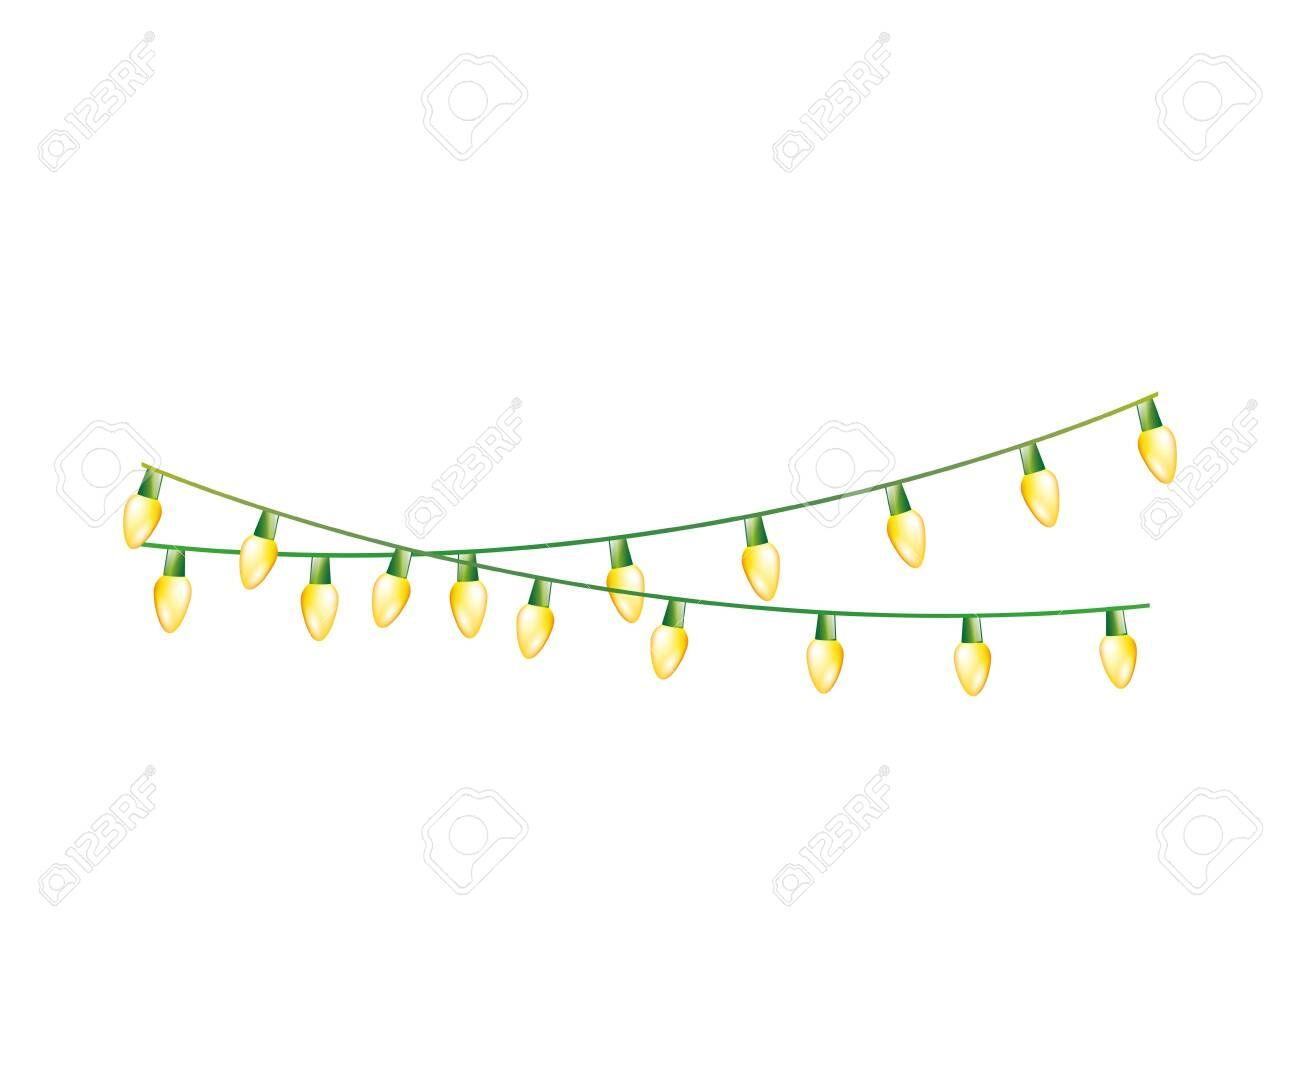 Christmas Lights Decoration Isolated Icon Vector Illustration Design Illus Vector Illustration Design Decorating With Christmas Lights Typography Design Layout